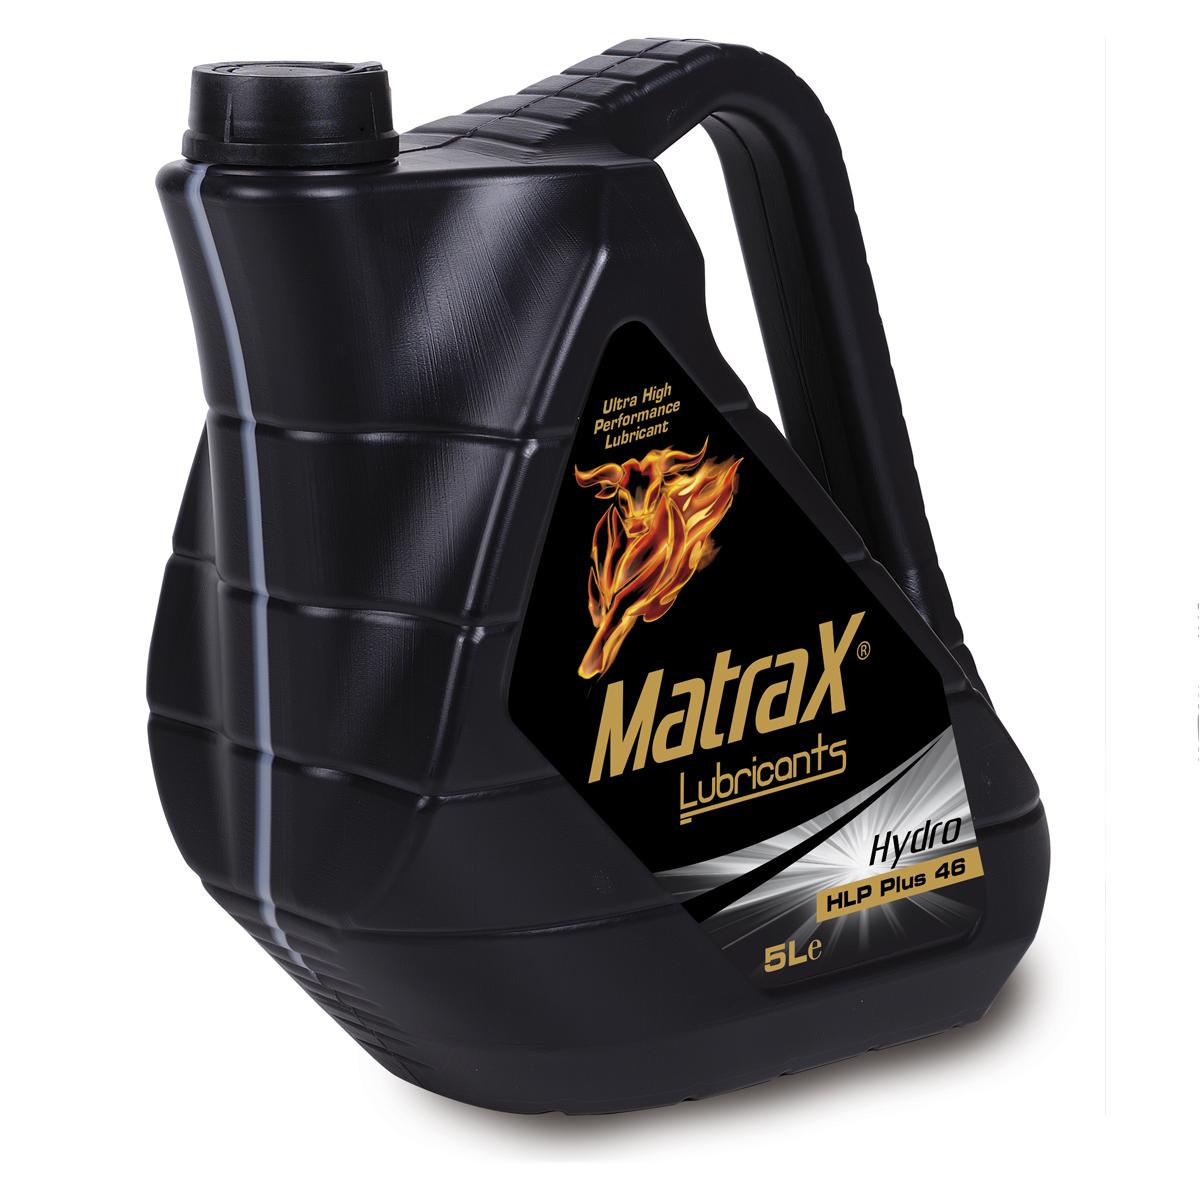 MatraX Hydro HLP Plus 46